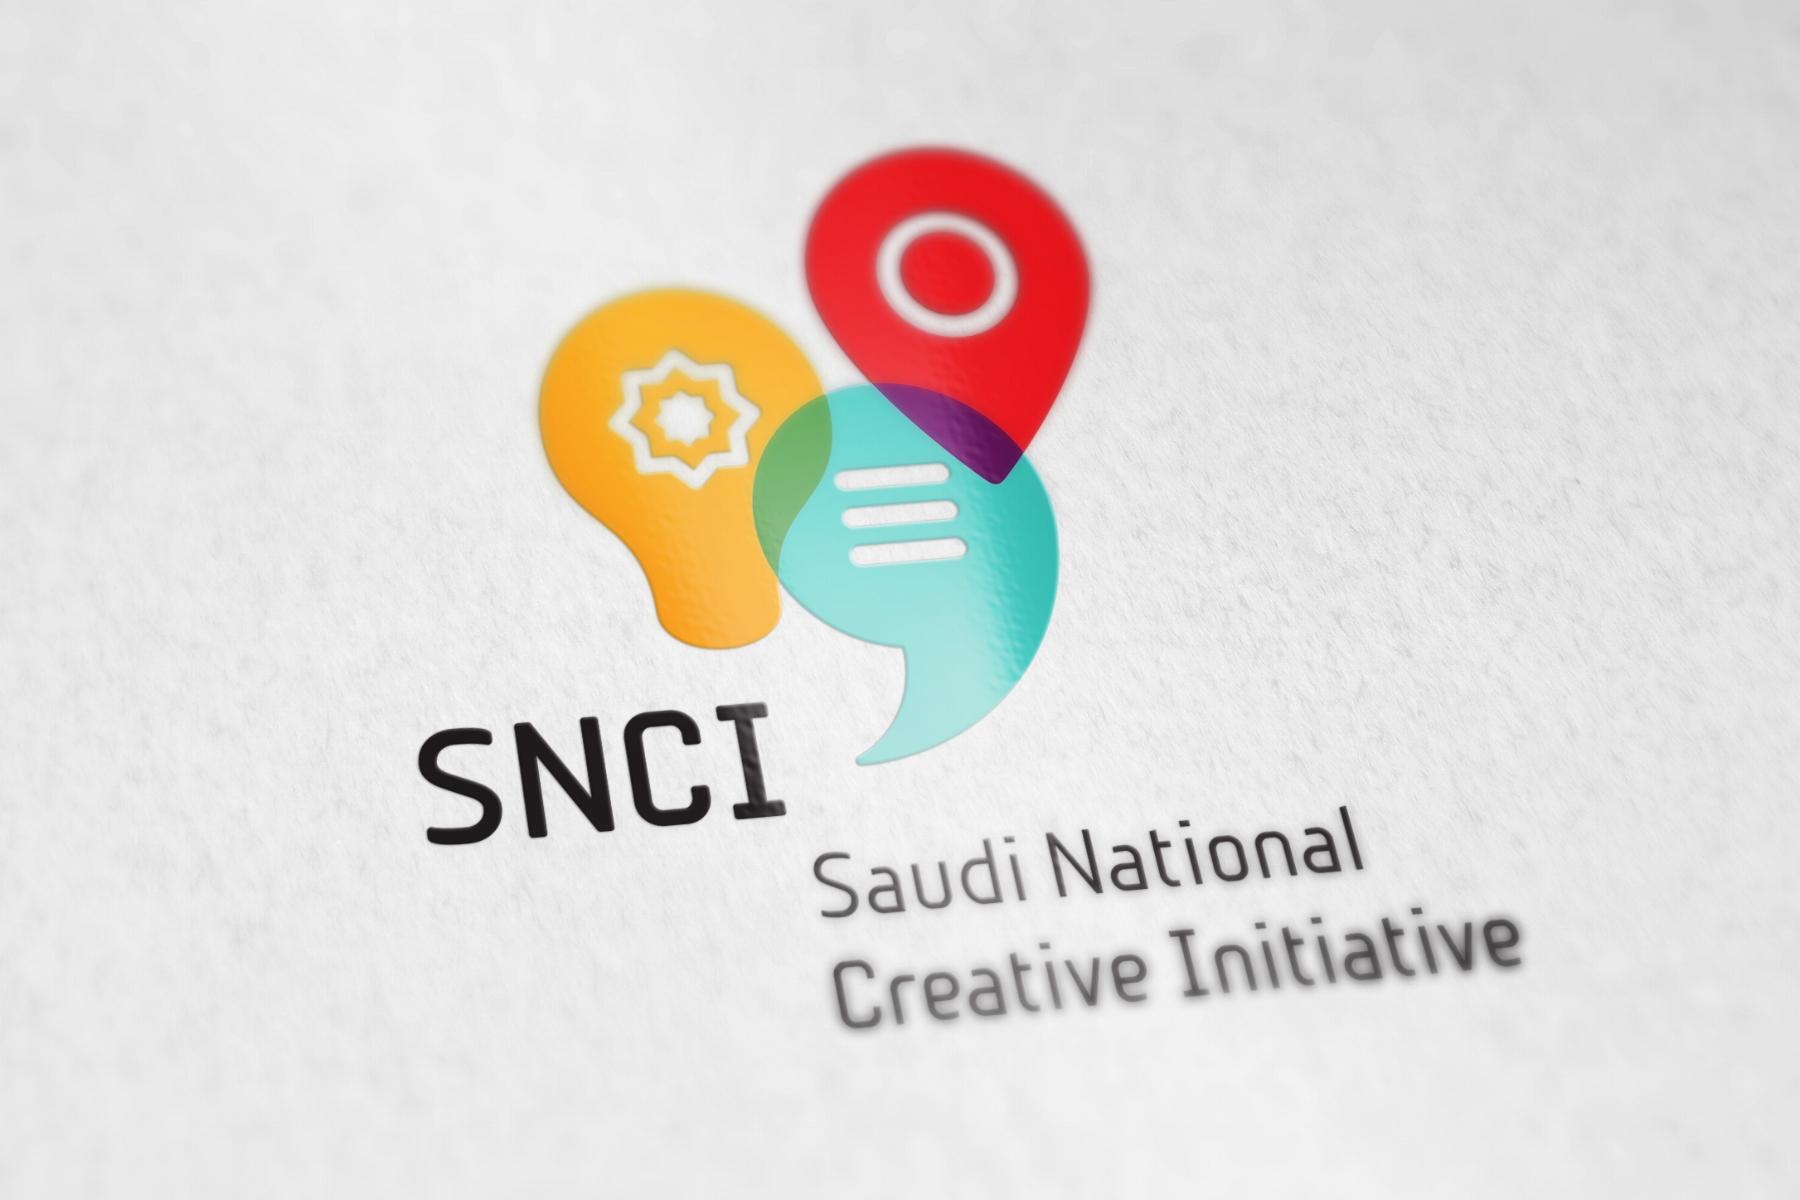 SNCI Saudi National Creative Initiative